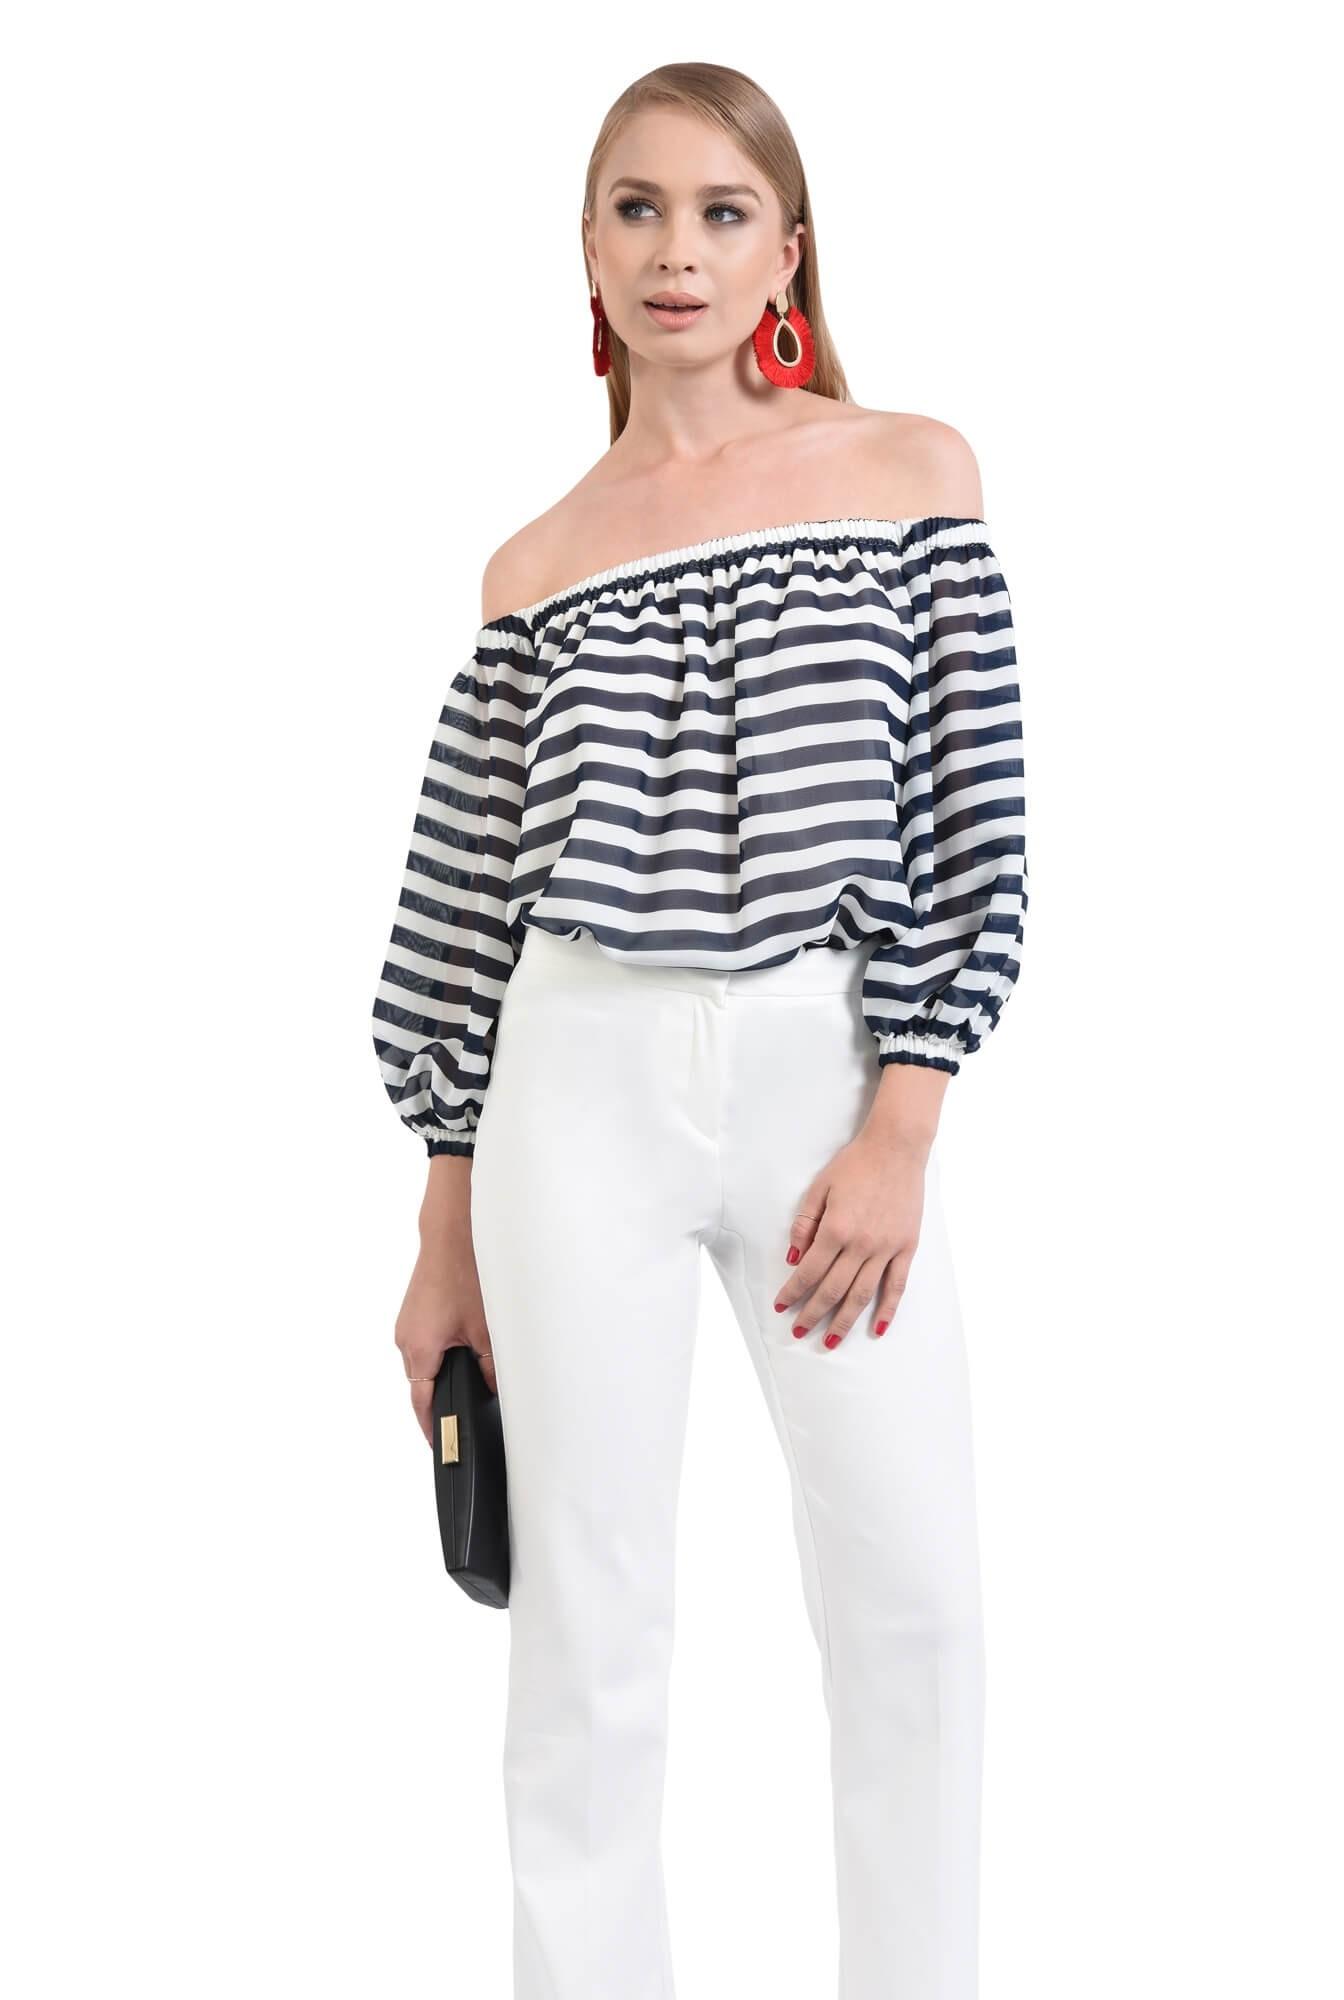 0 - bluza eleganta cu dungi, alb, bleumarin, decolteu elastic, sifon, maneci lungi